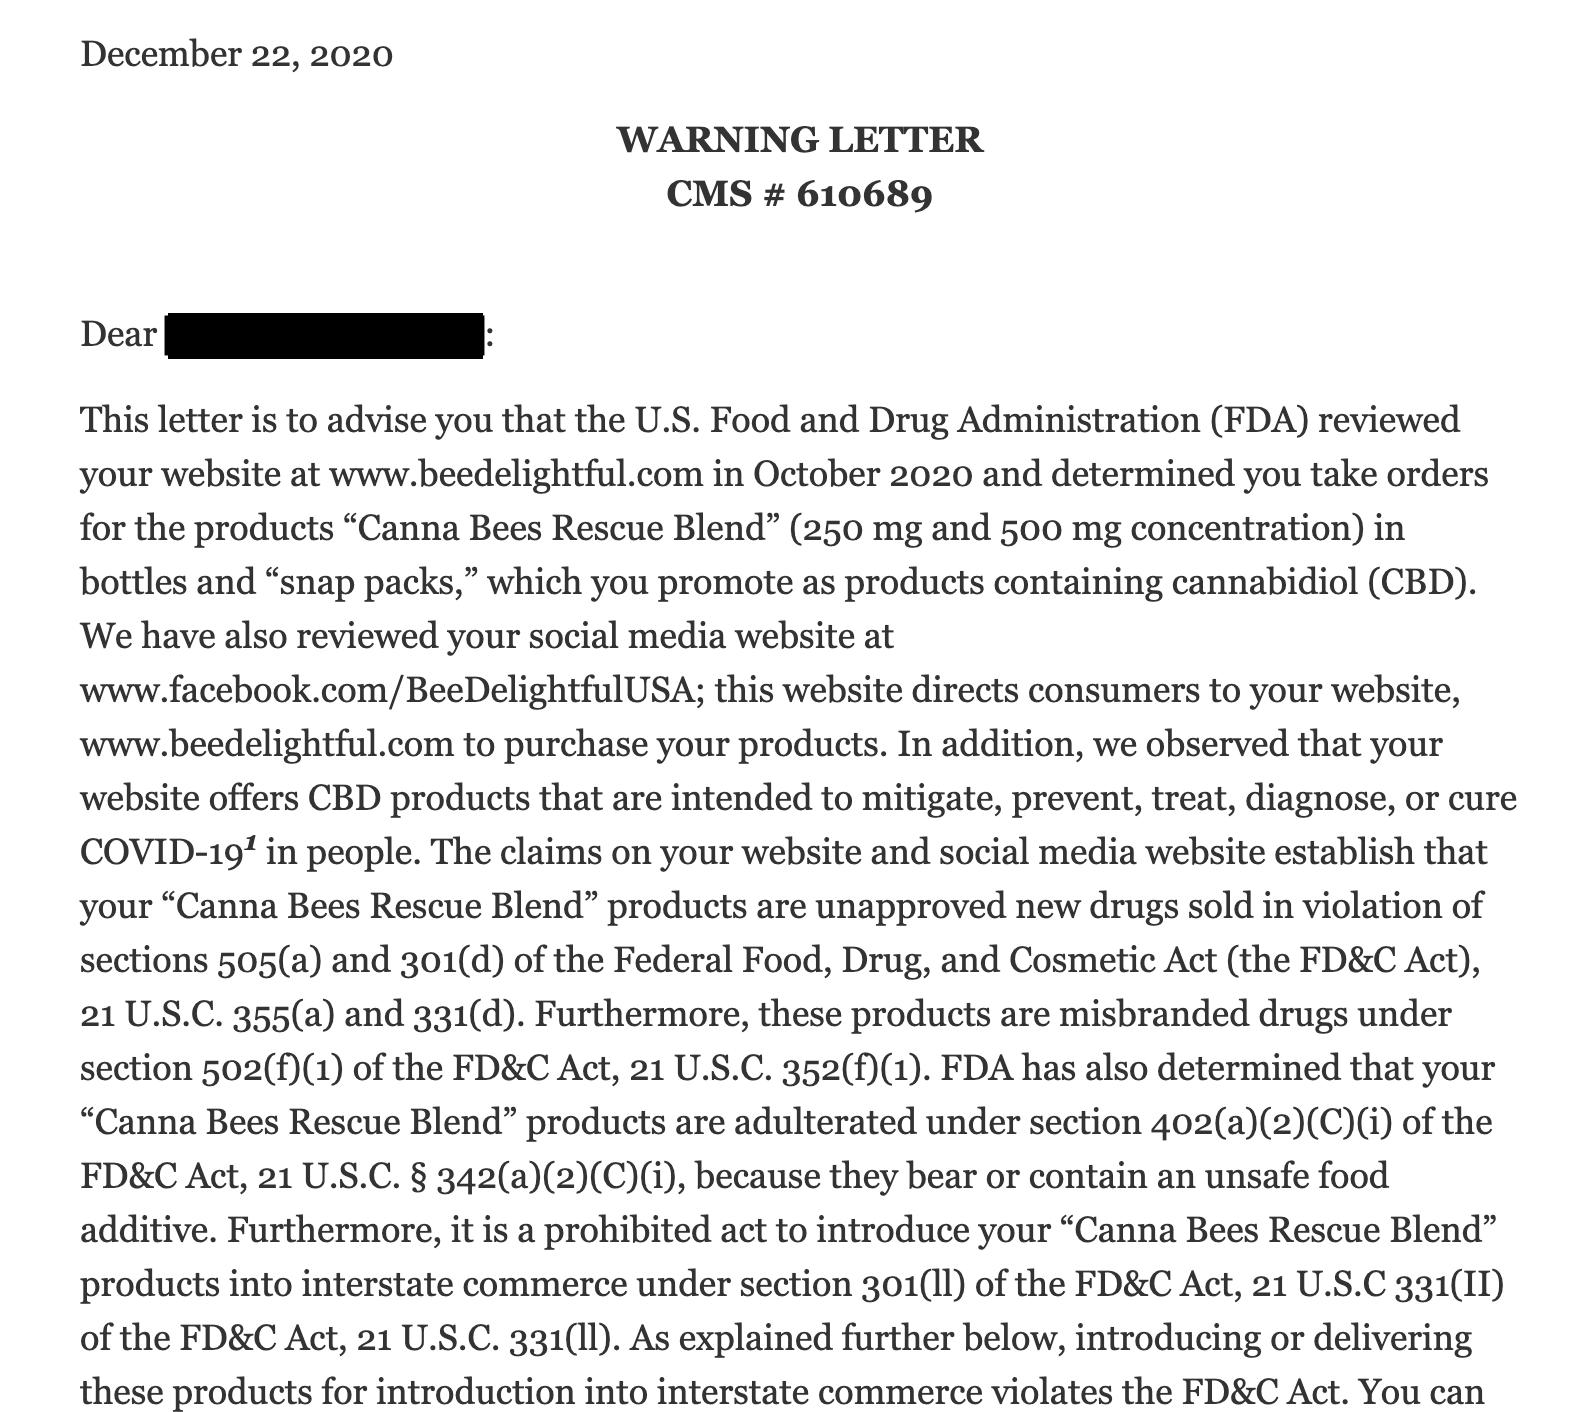 Example of FDA Advertising Warning Letter